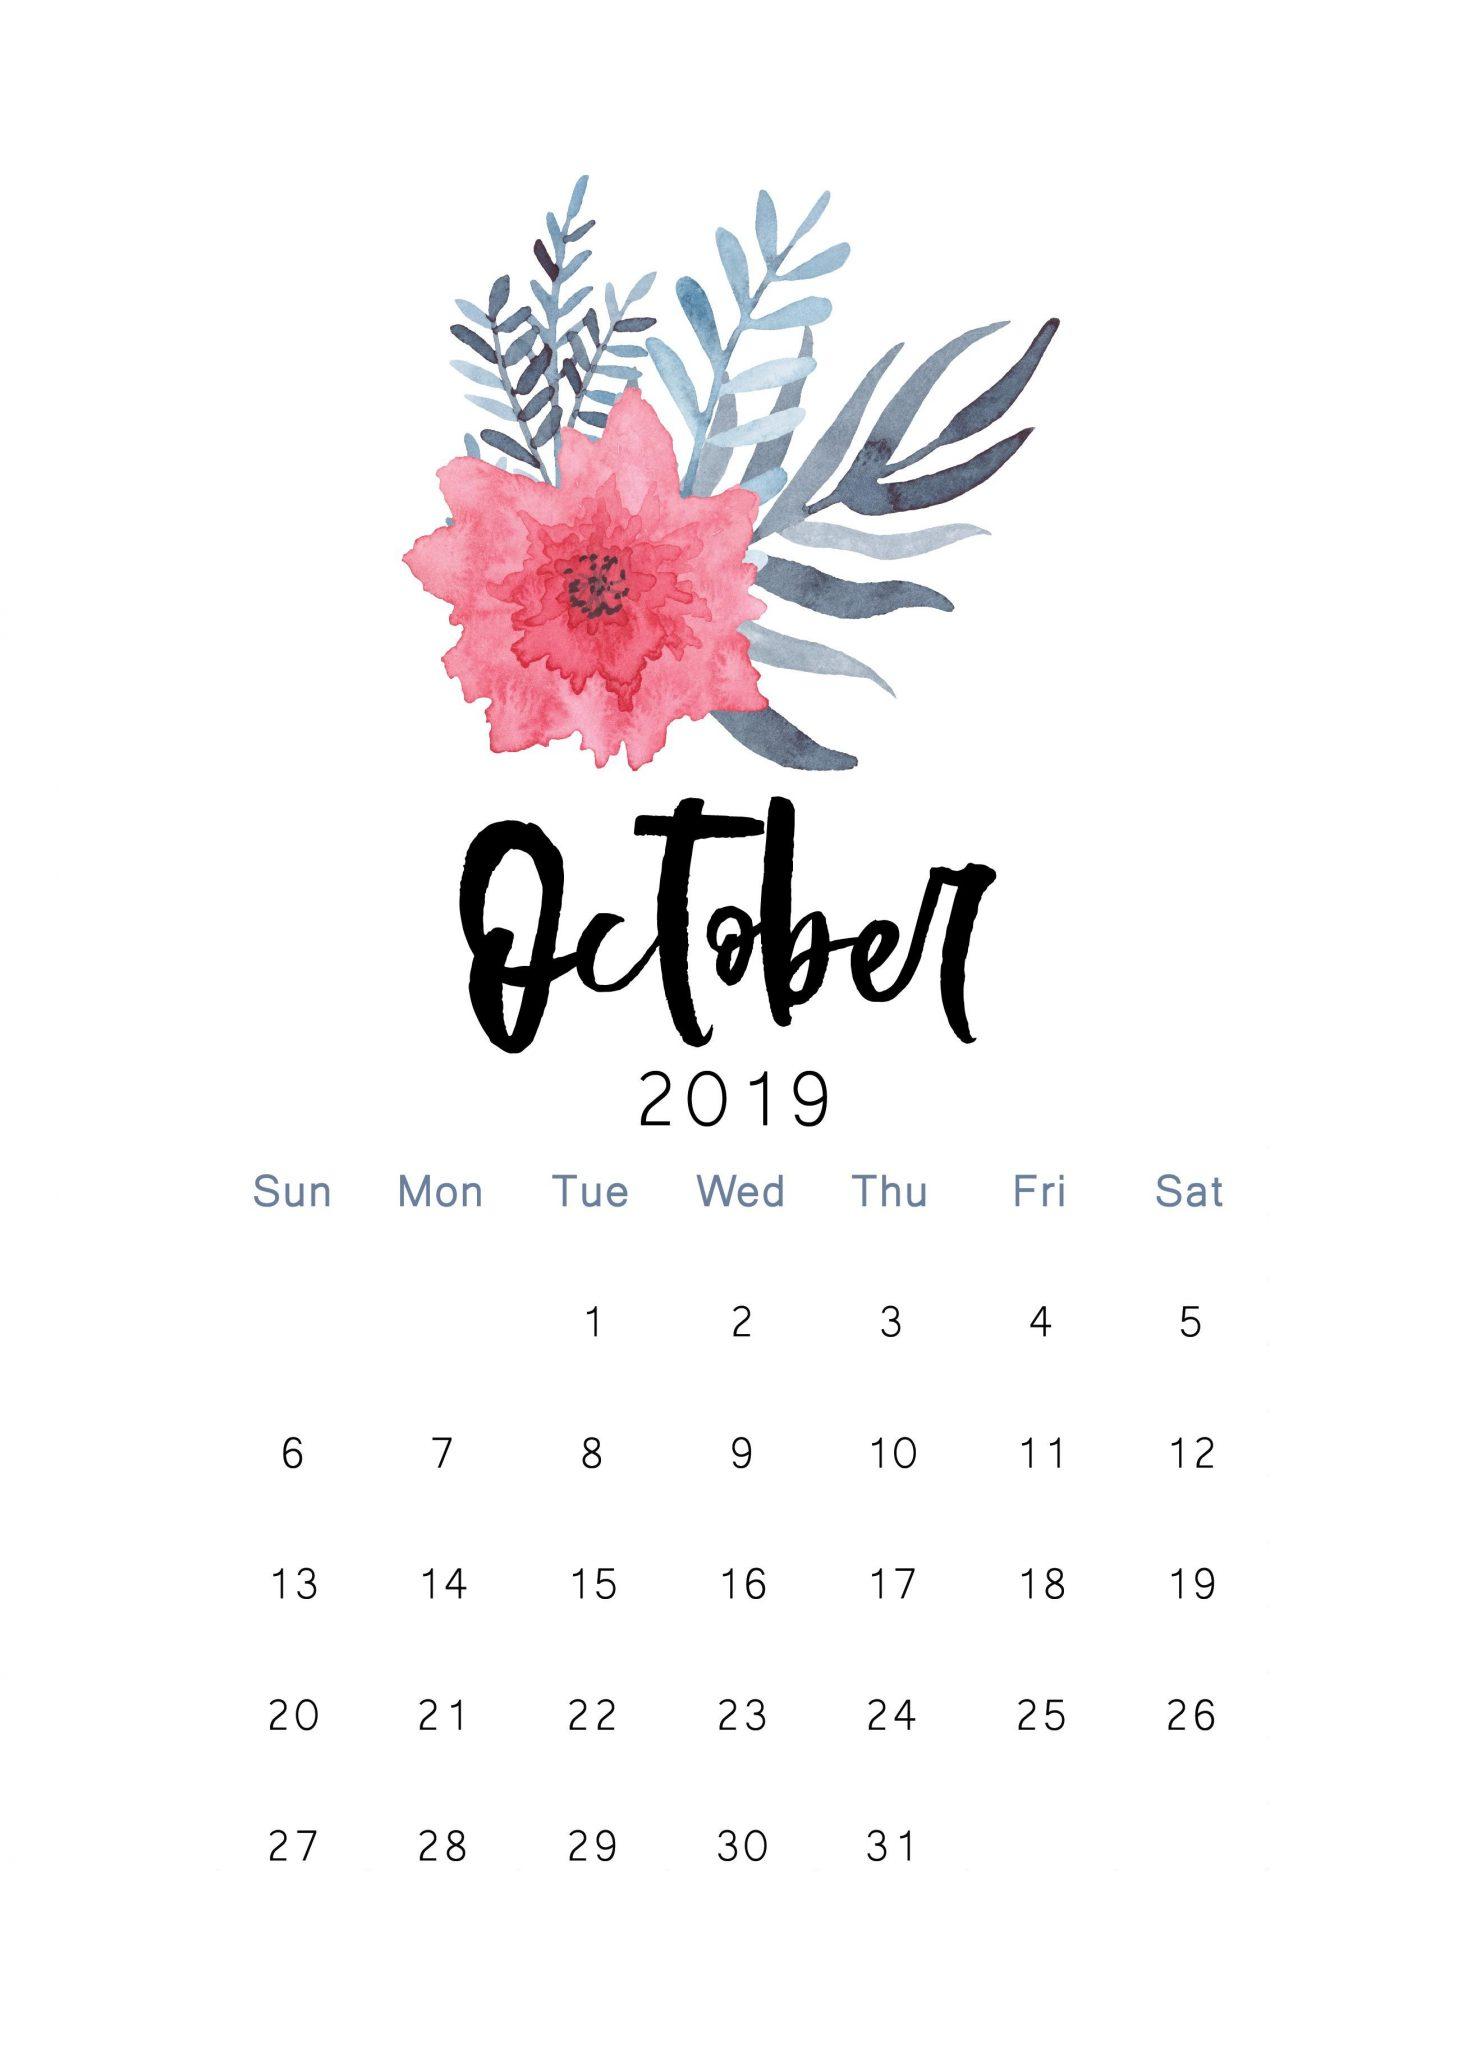 Floral October 2019 Wall Calendar